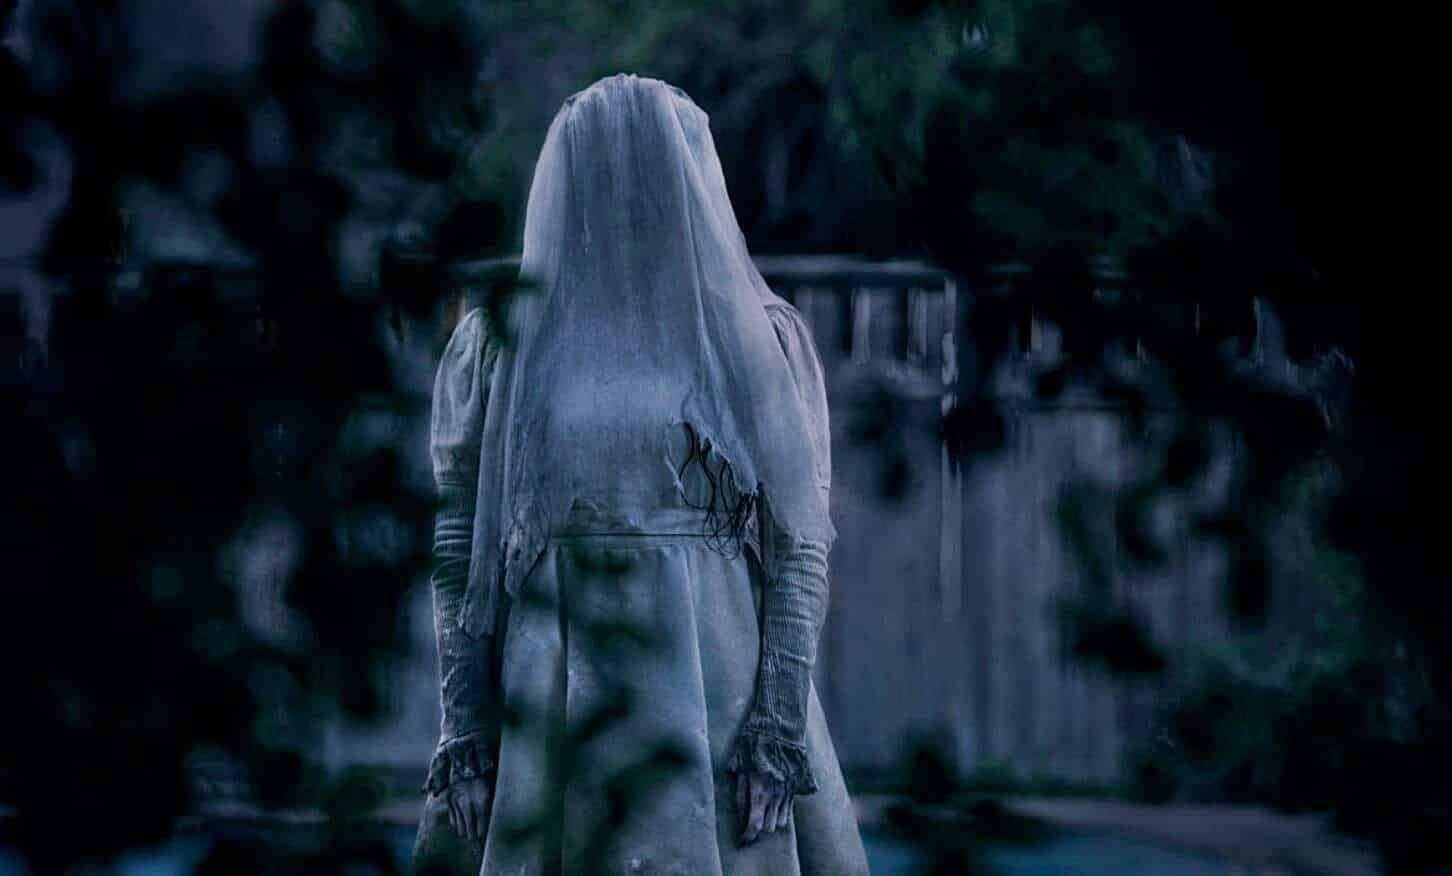 The Curse Of La Llorona The Conjuring